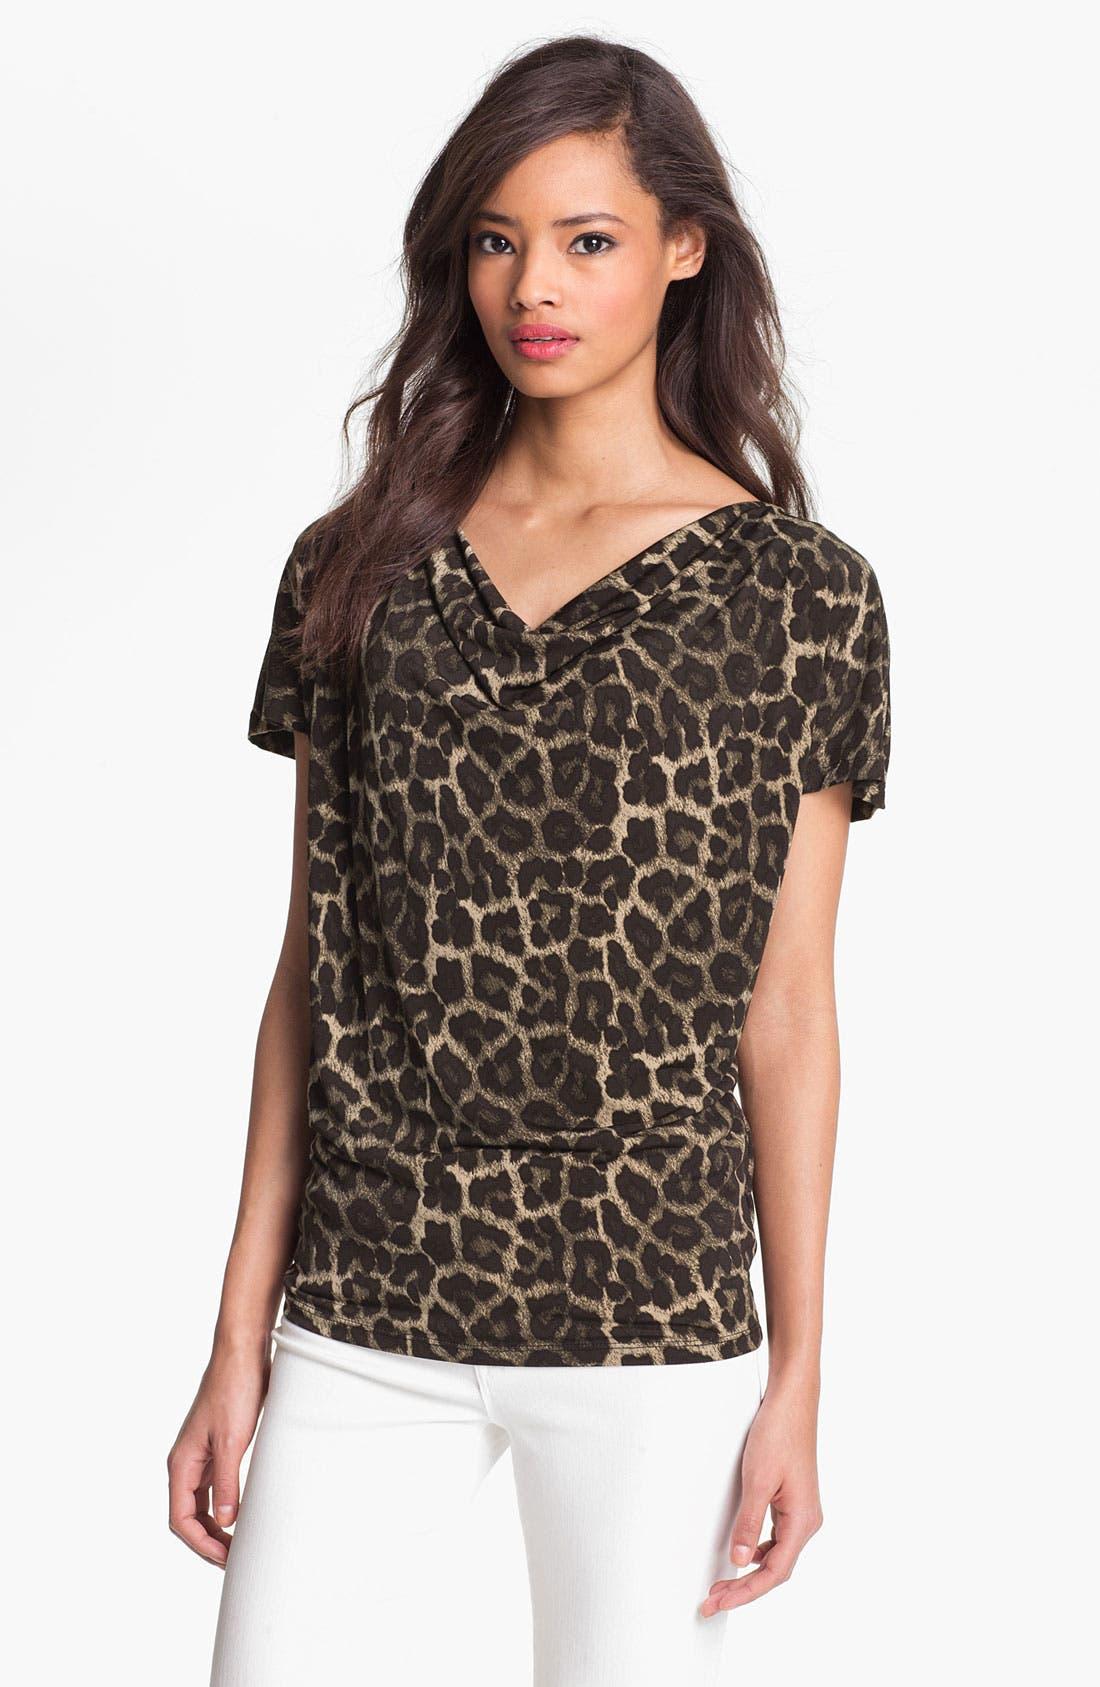 Main Image - MICHAEL Michael Kors 'Savannah' Leopard Print Top (Petite)